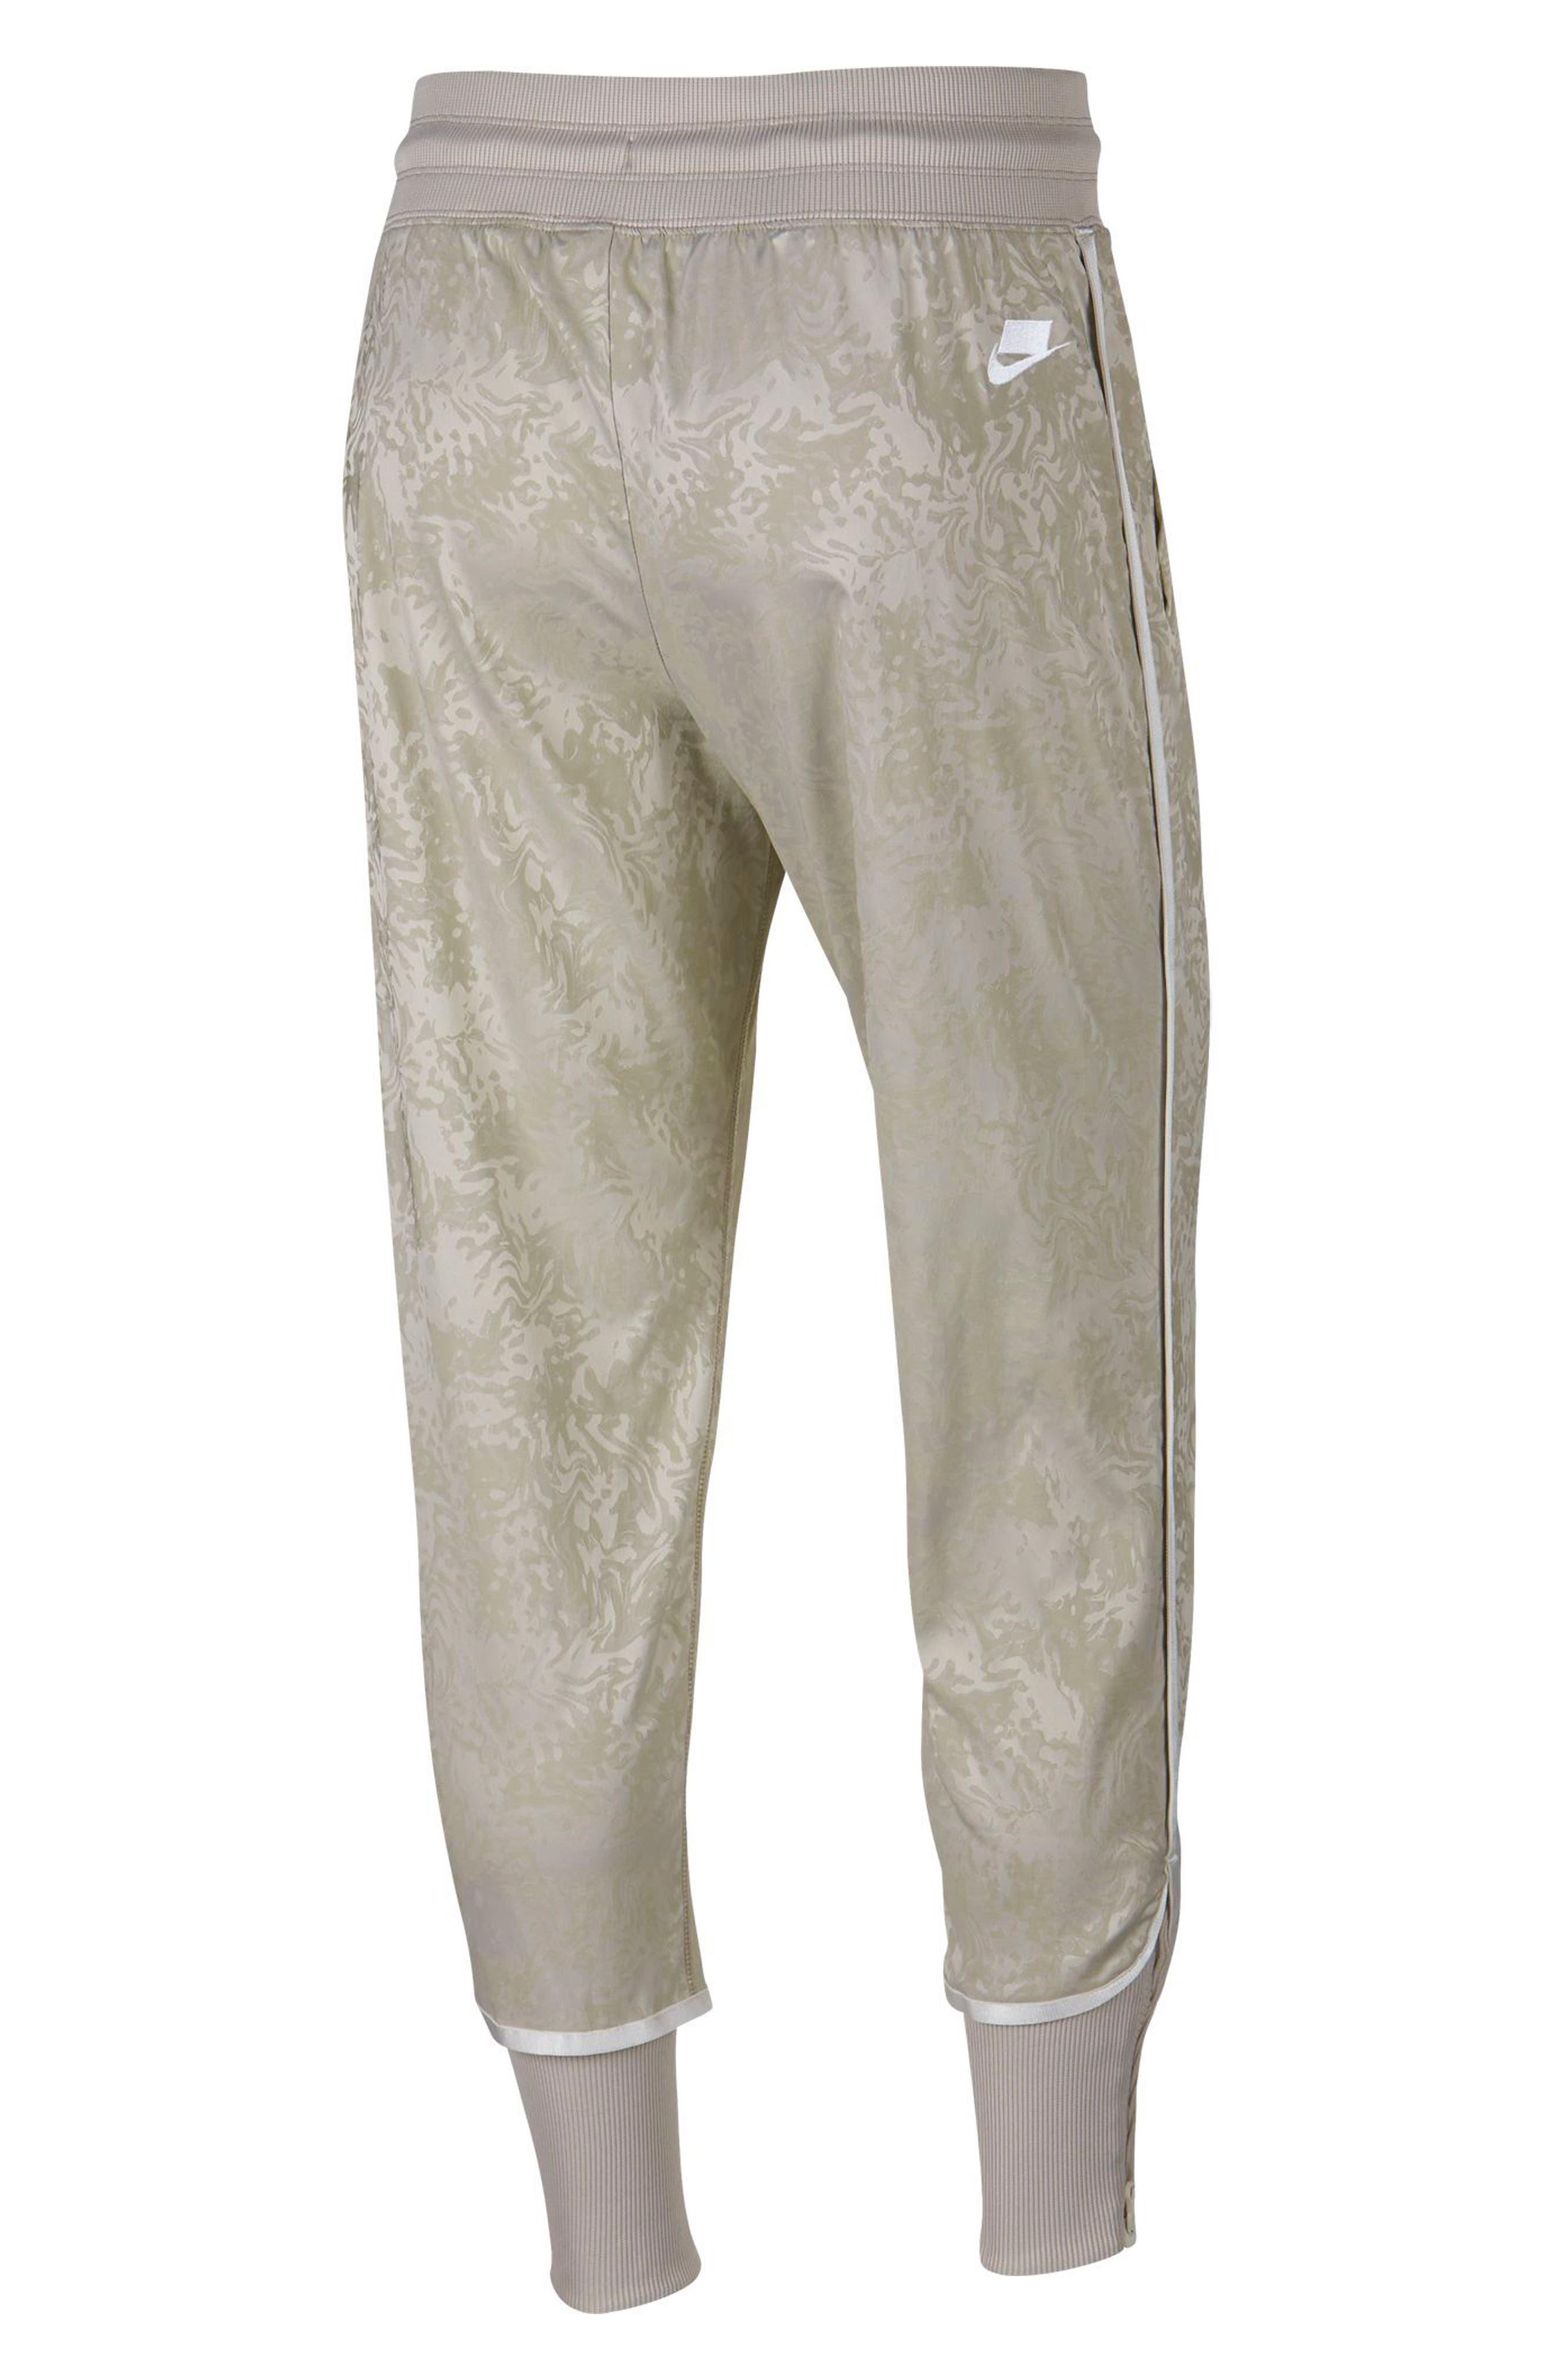 Sportswear NSW Women's Track Pants,                             Alternate thumbnail 2, color,                             STRING/ PHANTOM/ WHITE